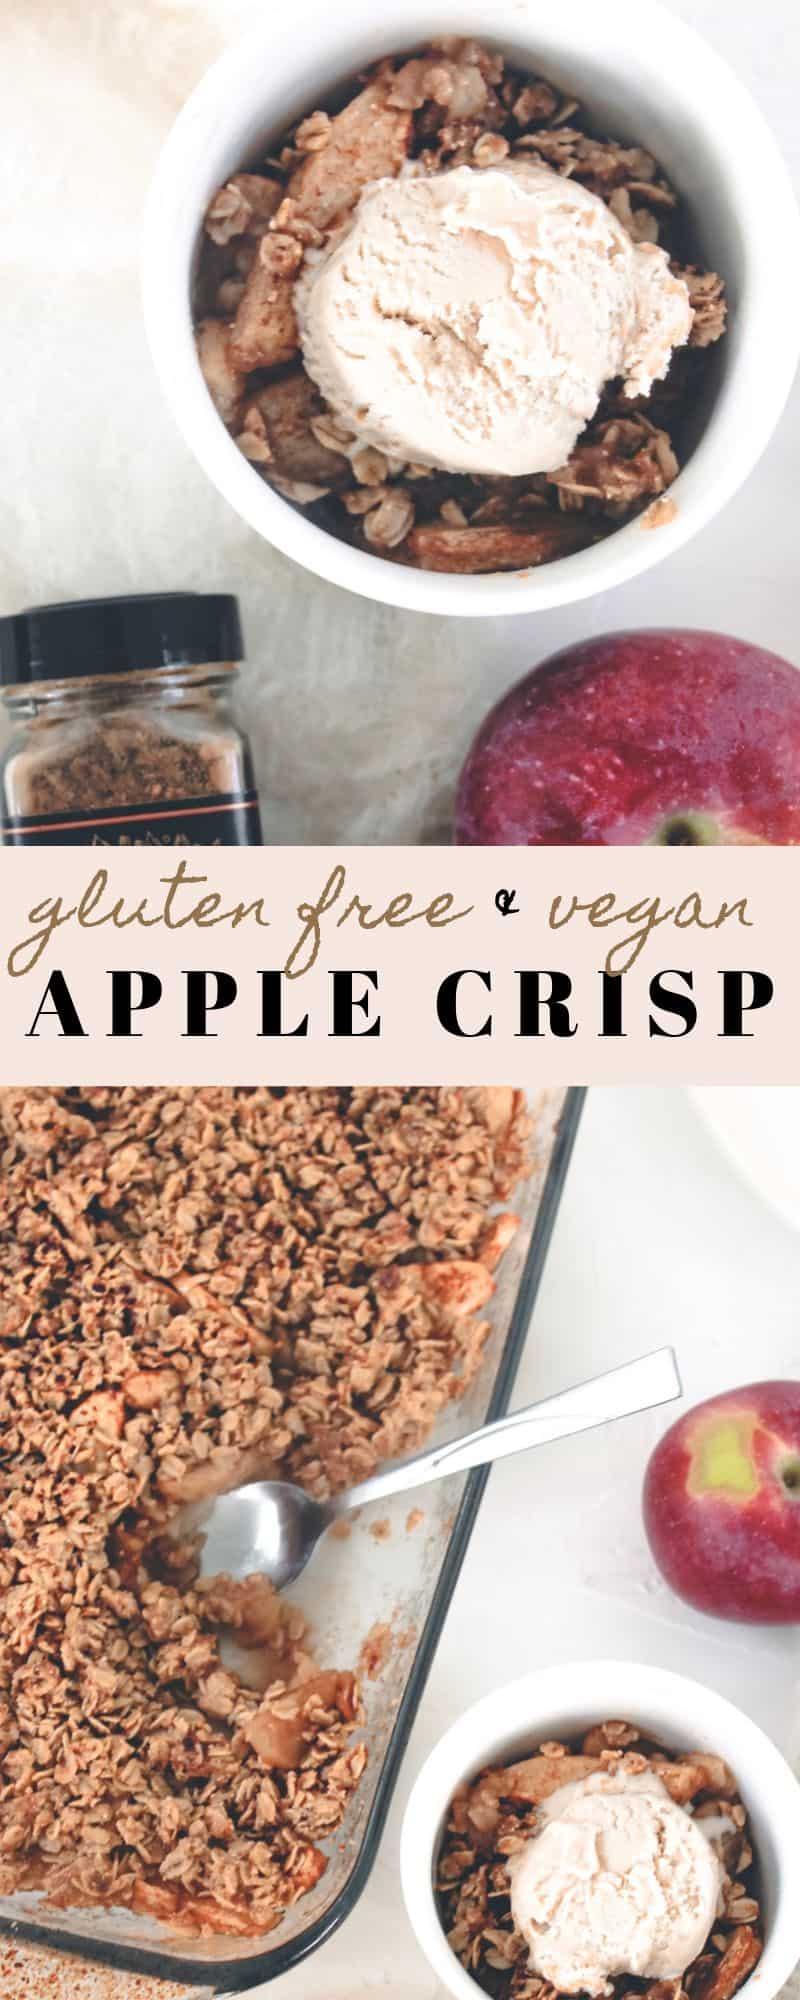 Sharing my ultimate favorite fall dessert - vegan & gluten free apple crisp, made with crisp apples, lots of cinnamon, oats, & cassava flour!